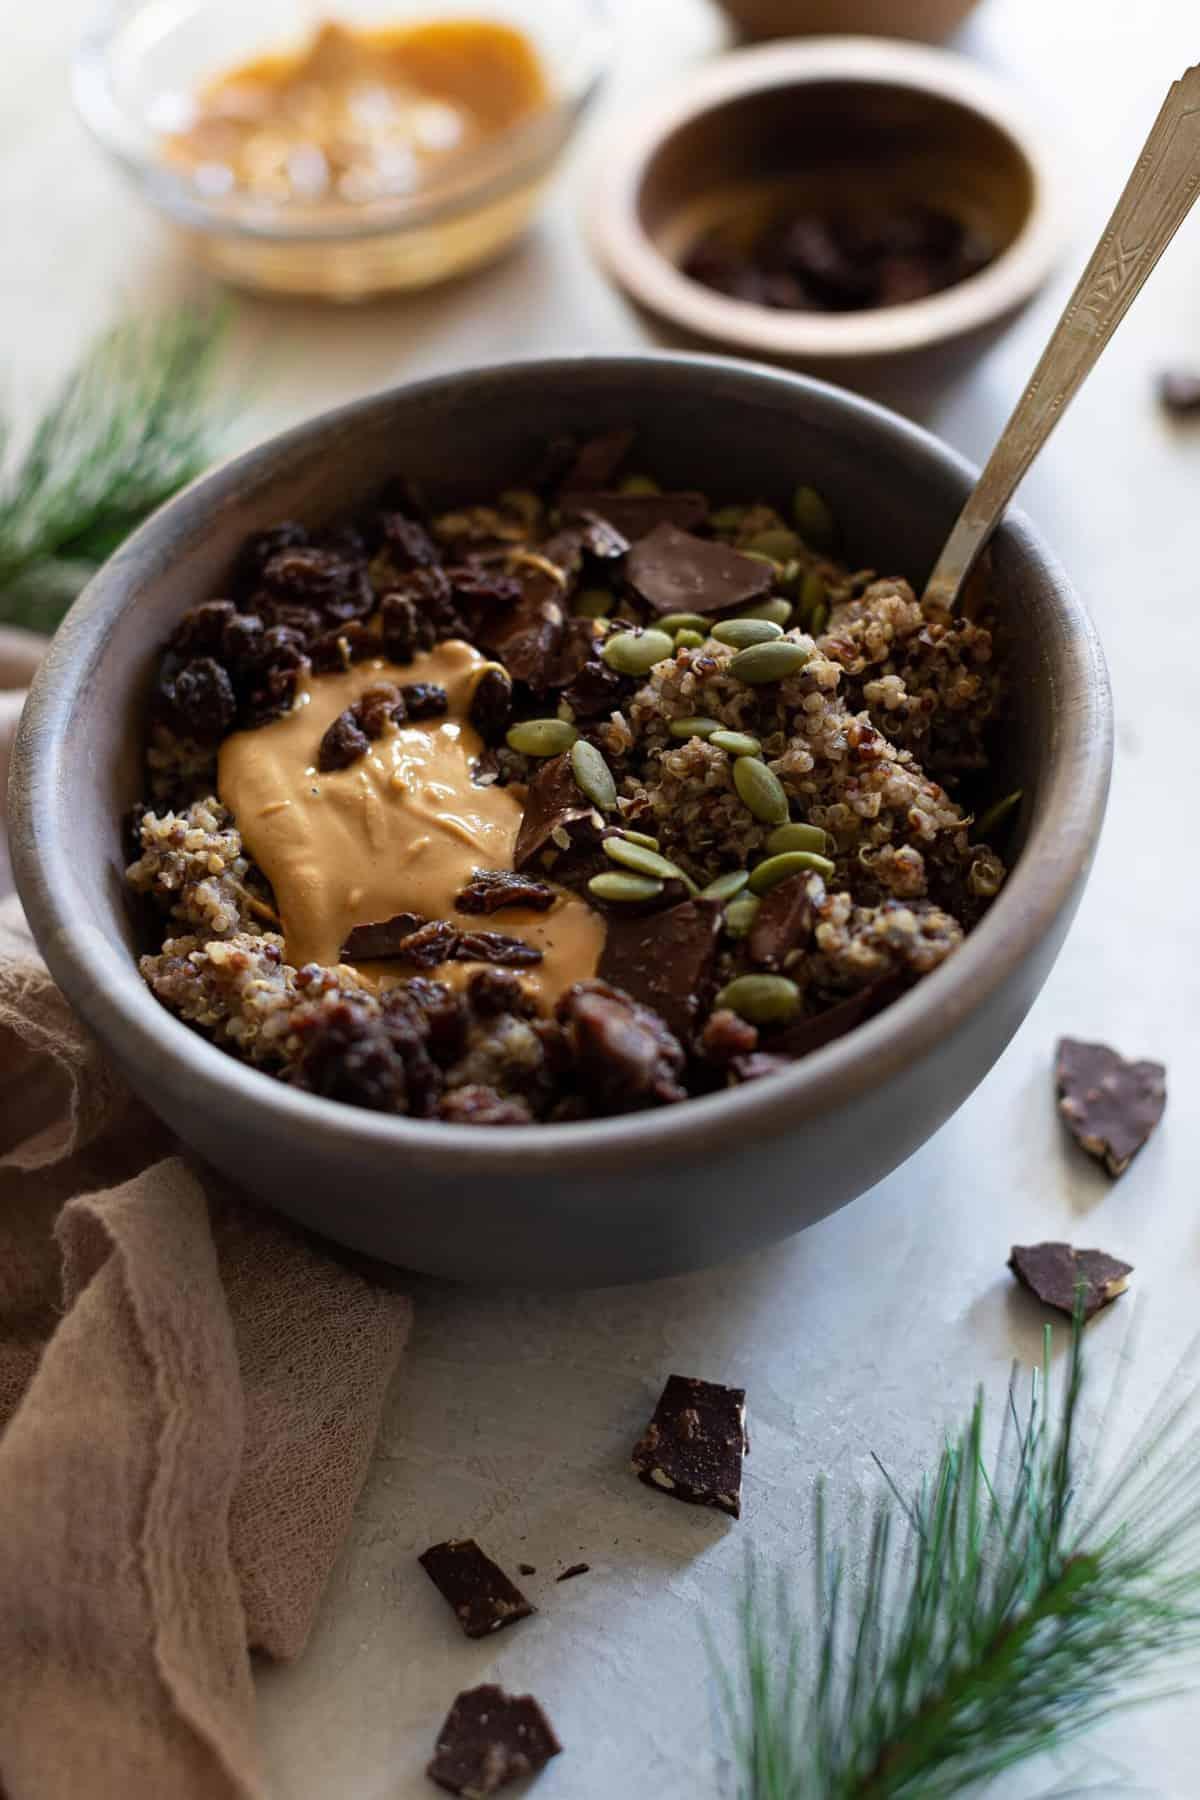 10-Minute Fall Harvest Quinoa Breakfast Bowl